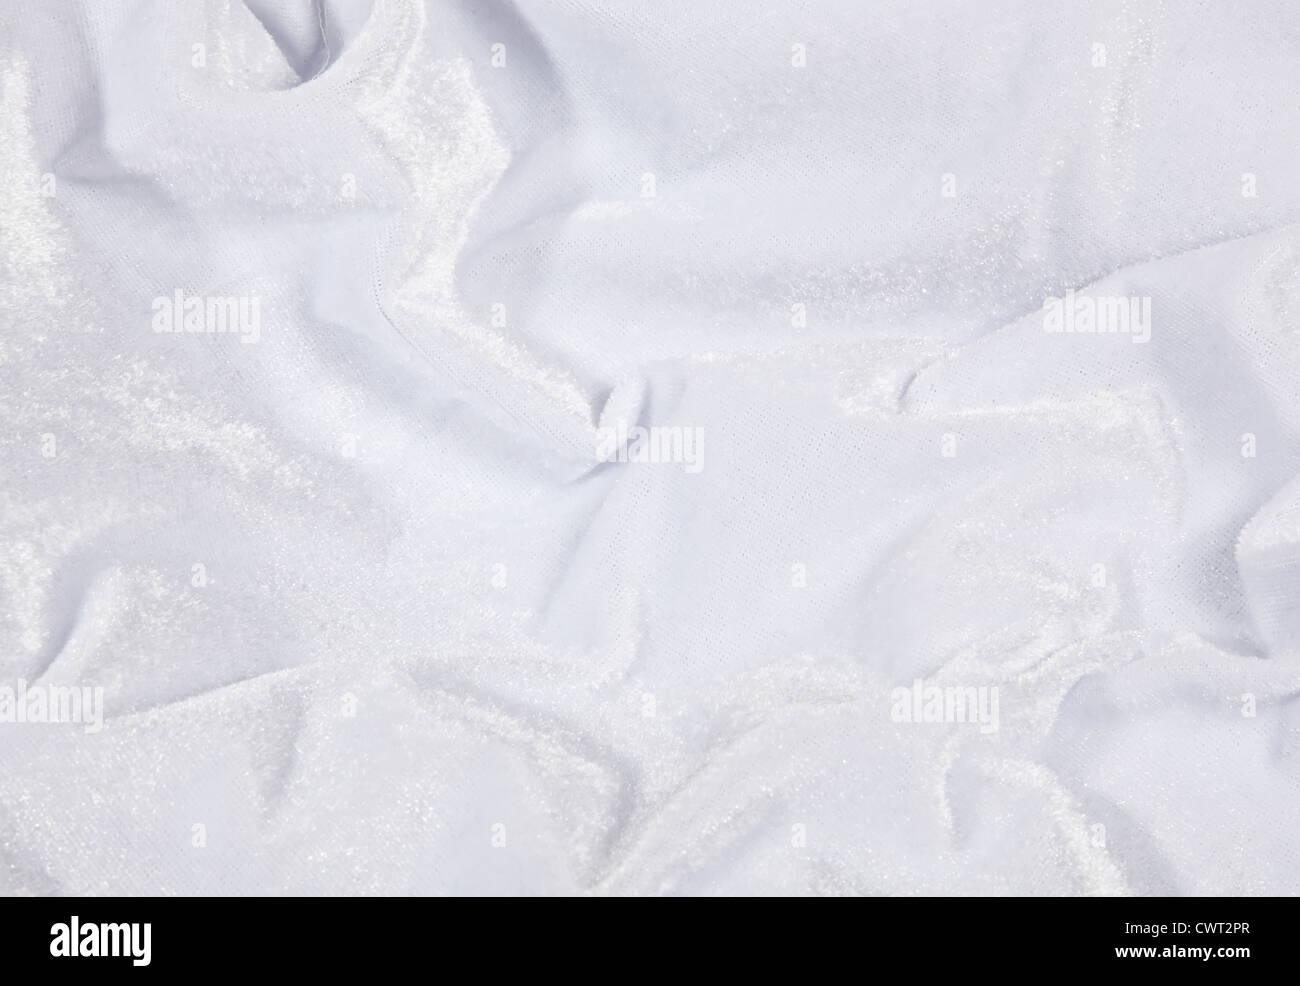 White Blanket Background Imágenes De Stock & White Blanket ...